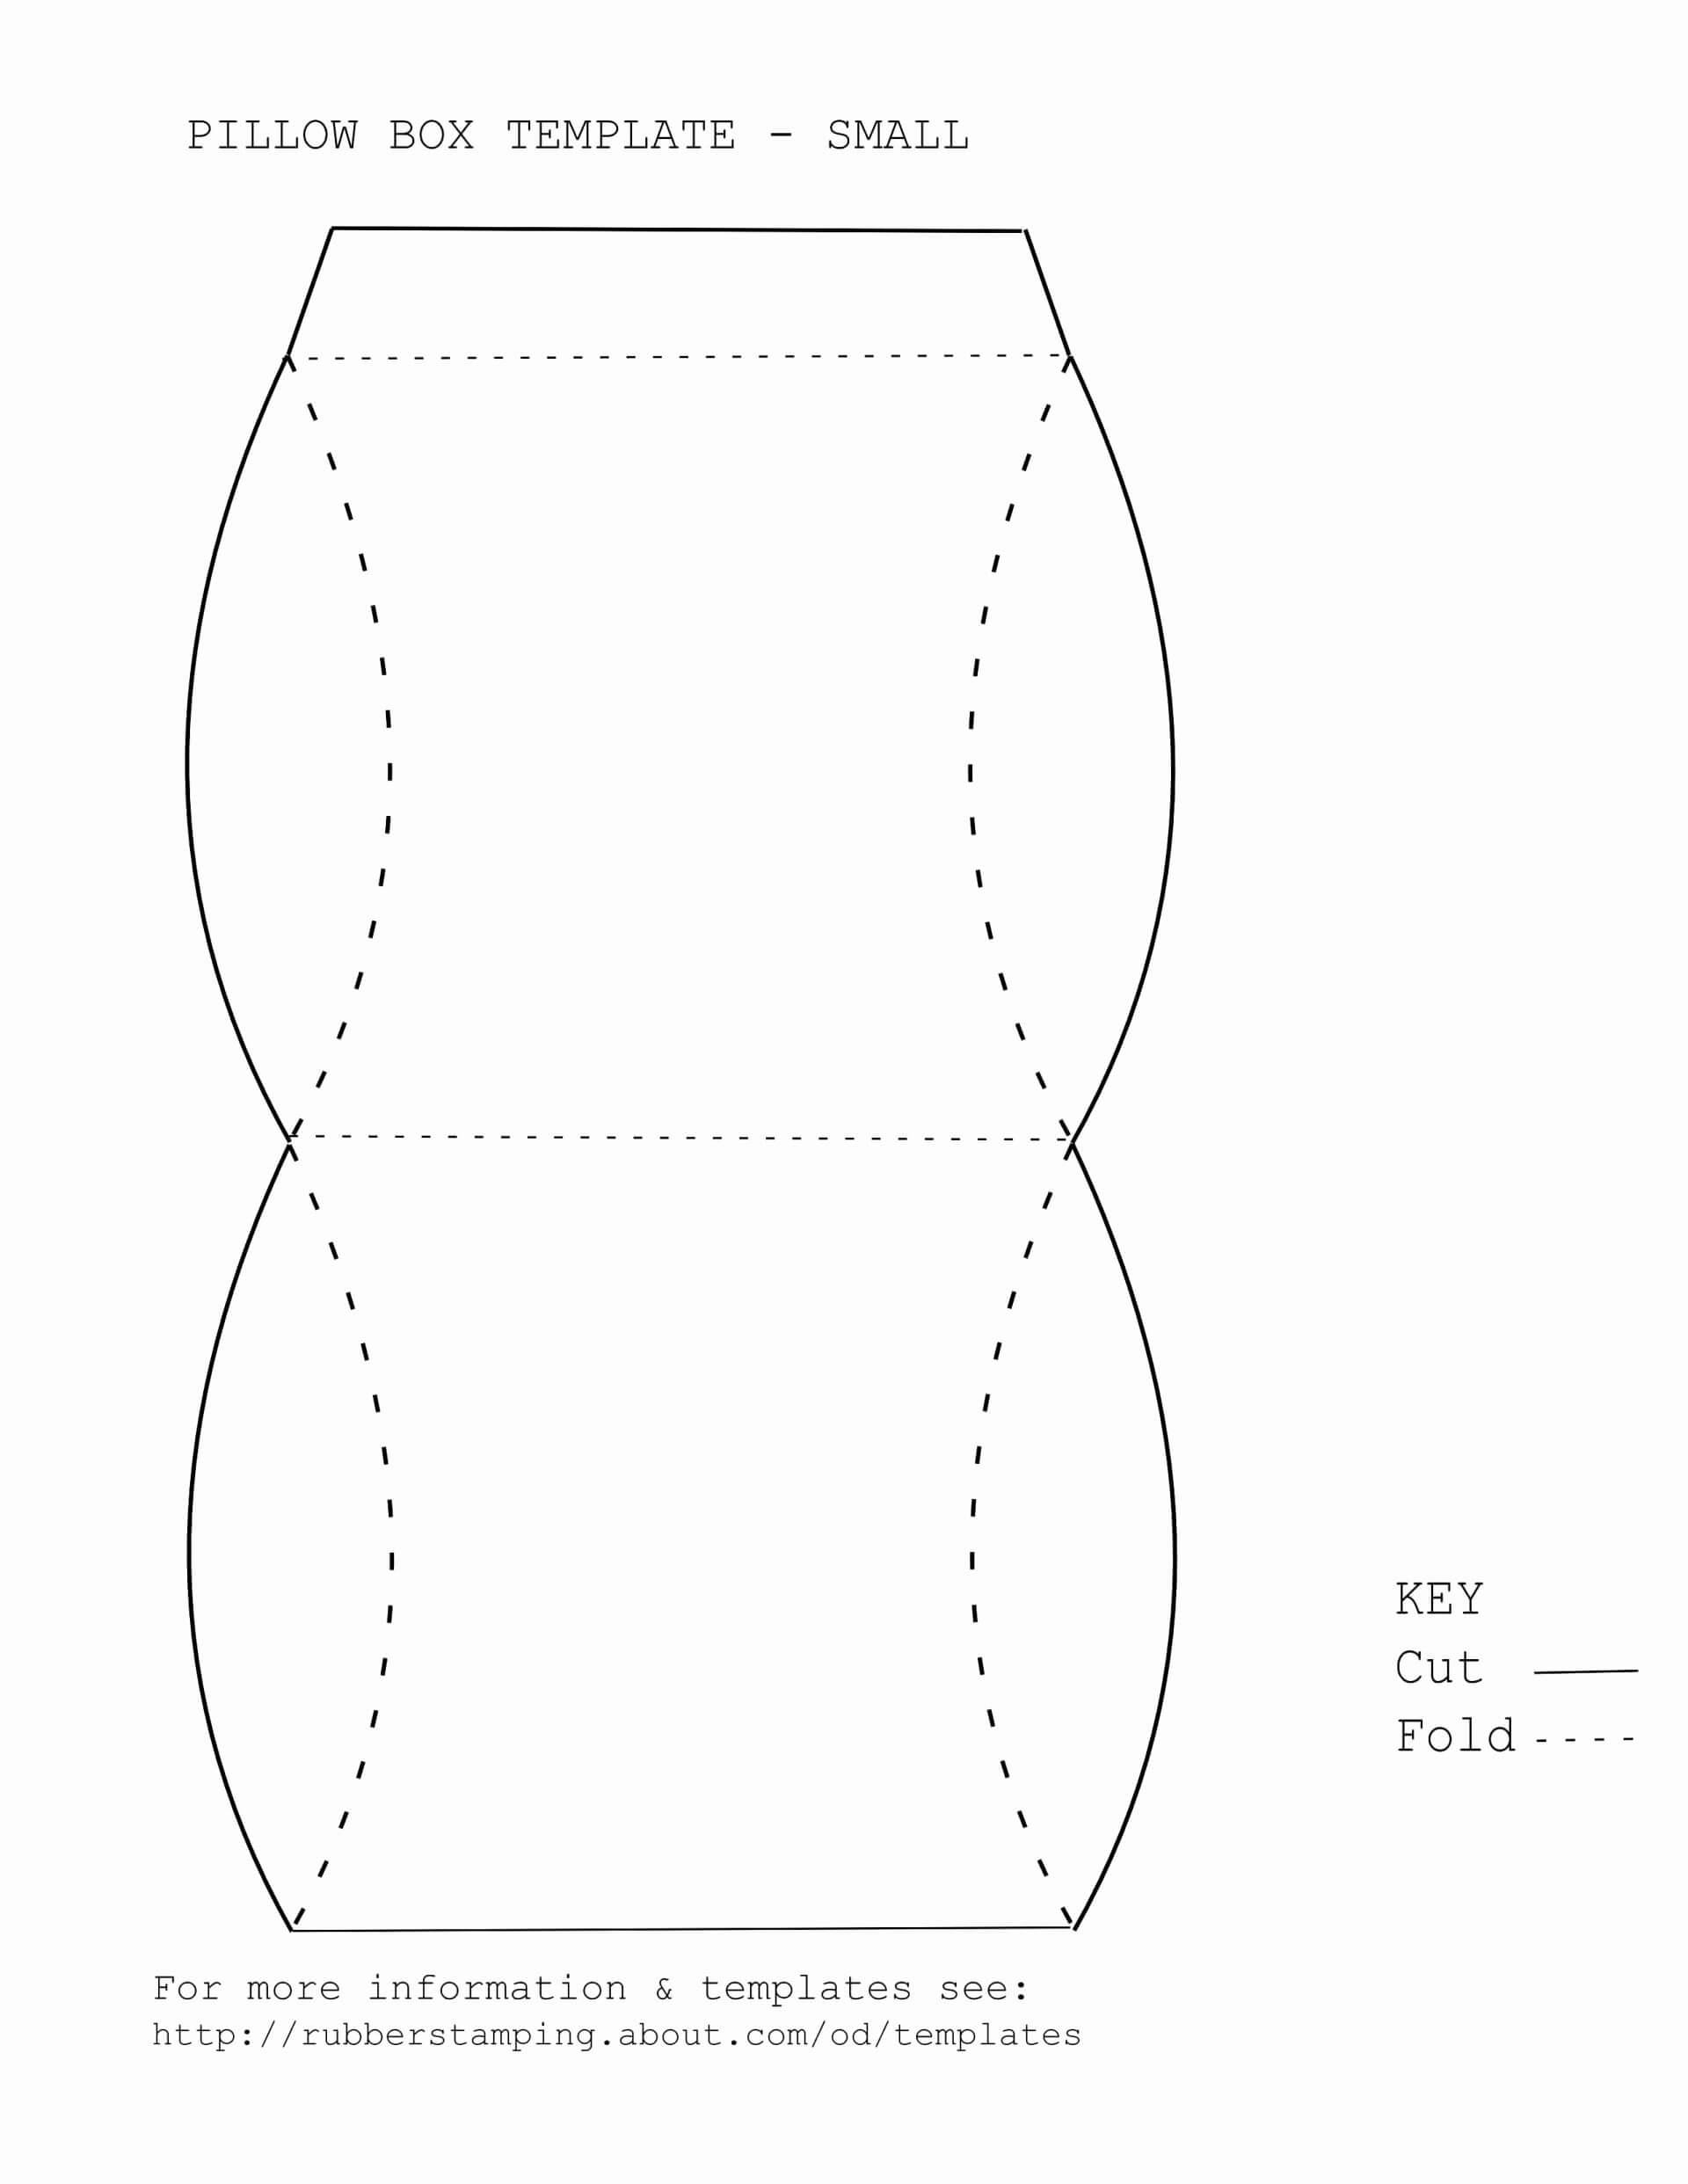 033 Free Decision Tree Template Astonishing Nodes Diagram Pertaining To Blank Decision Tree Template